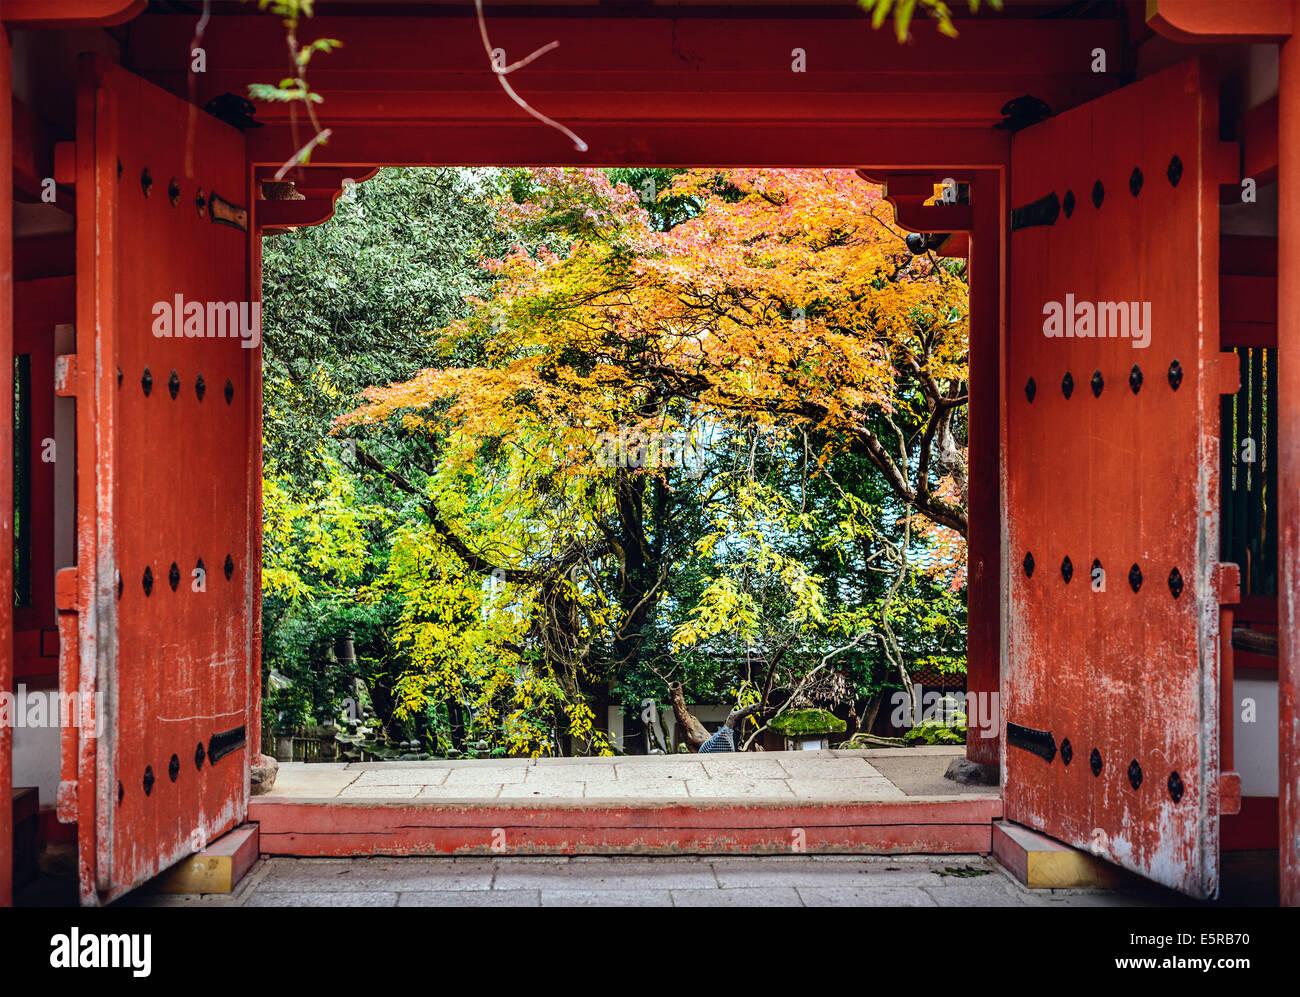 Nara, Japan at Kasuga-Taisha Shrine with fall foliage. Stock Photo